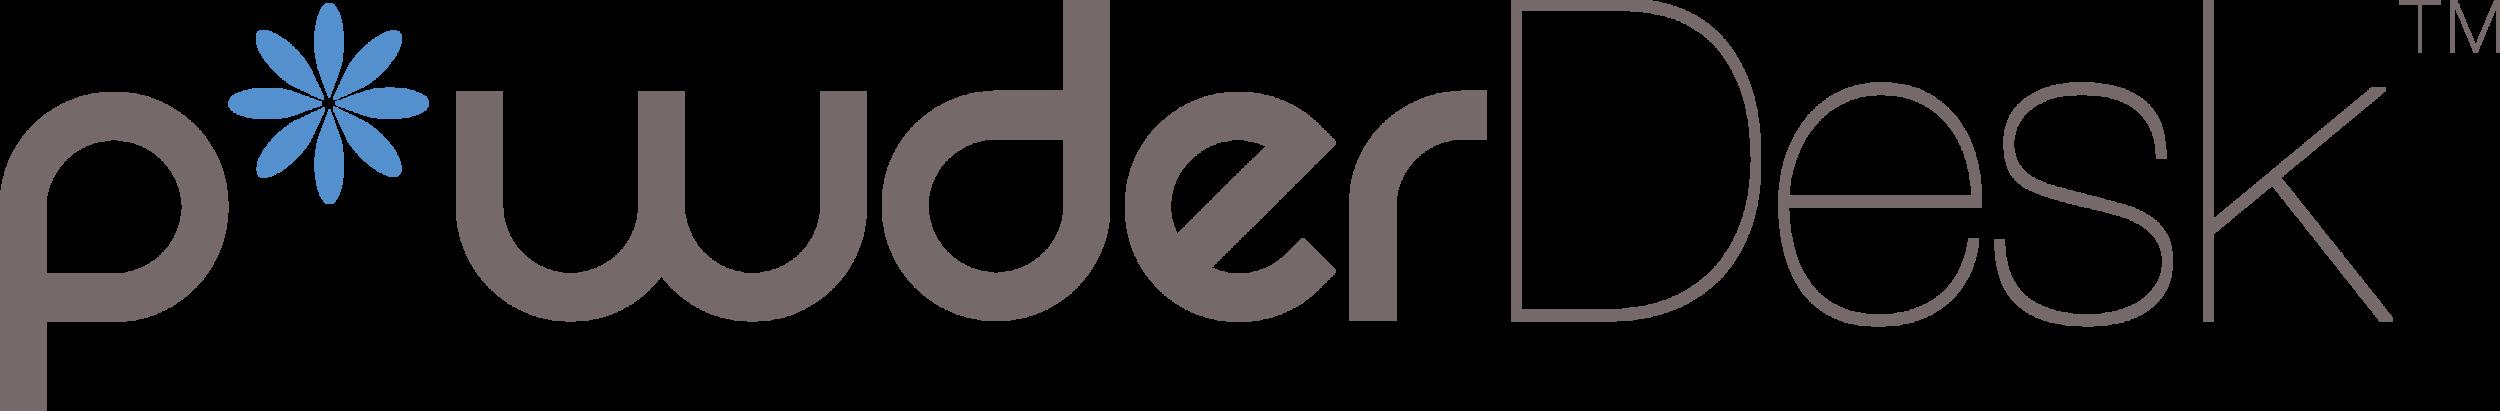 powderDesk-Logo-Transparent-Web_x-large.png